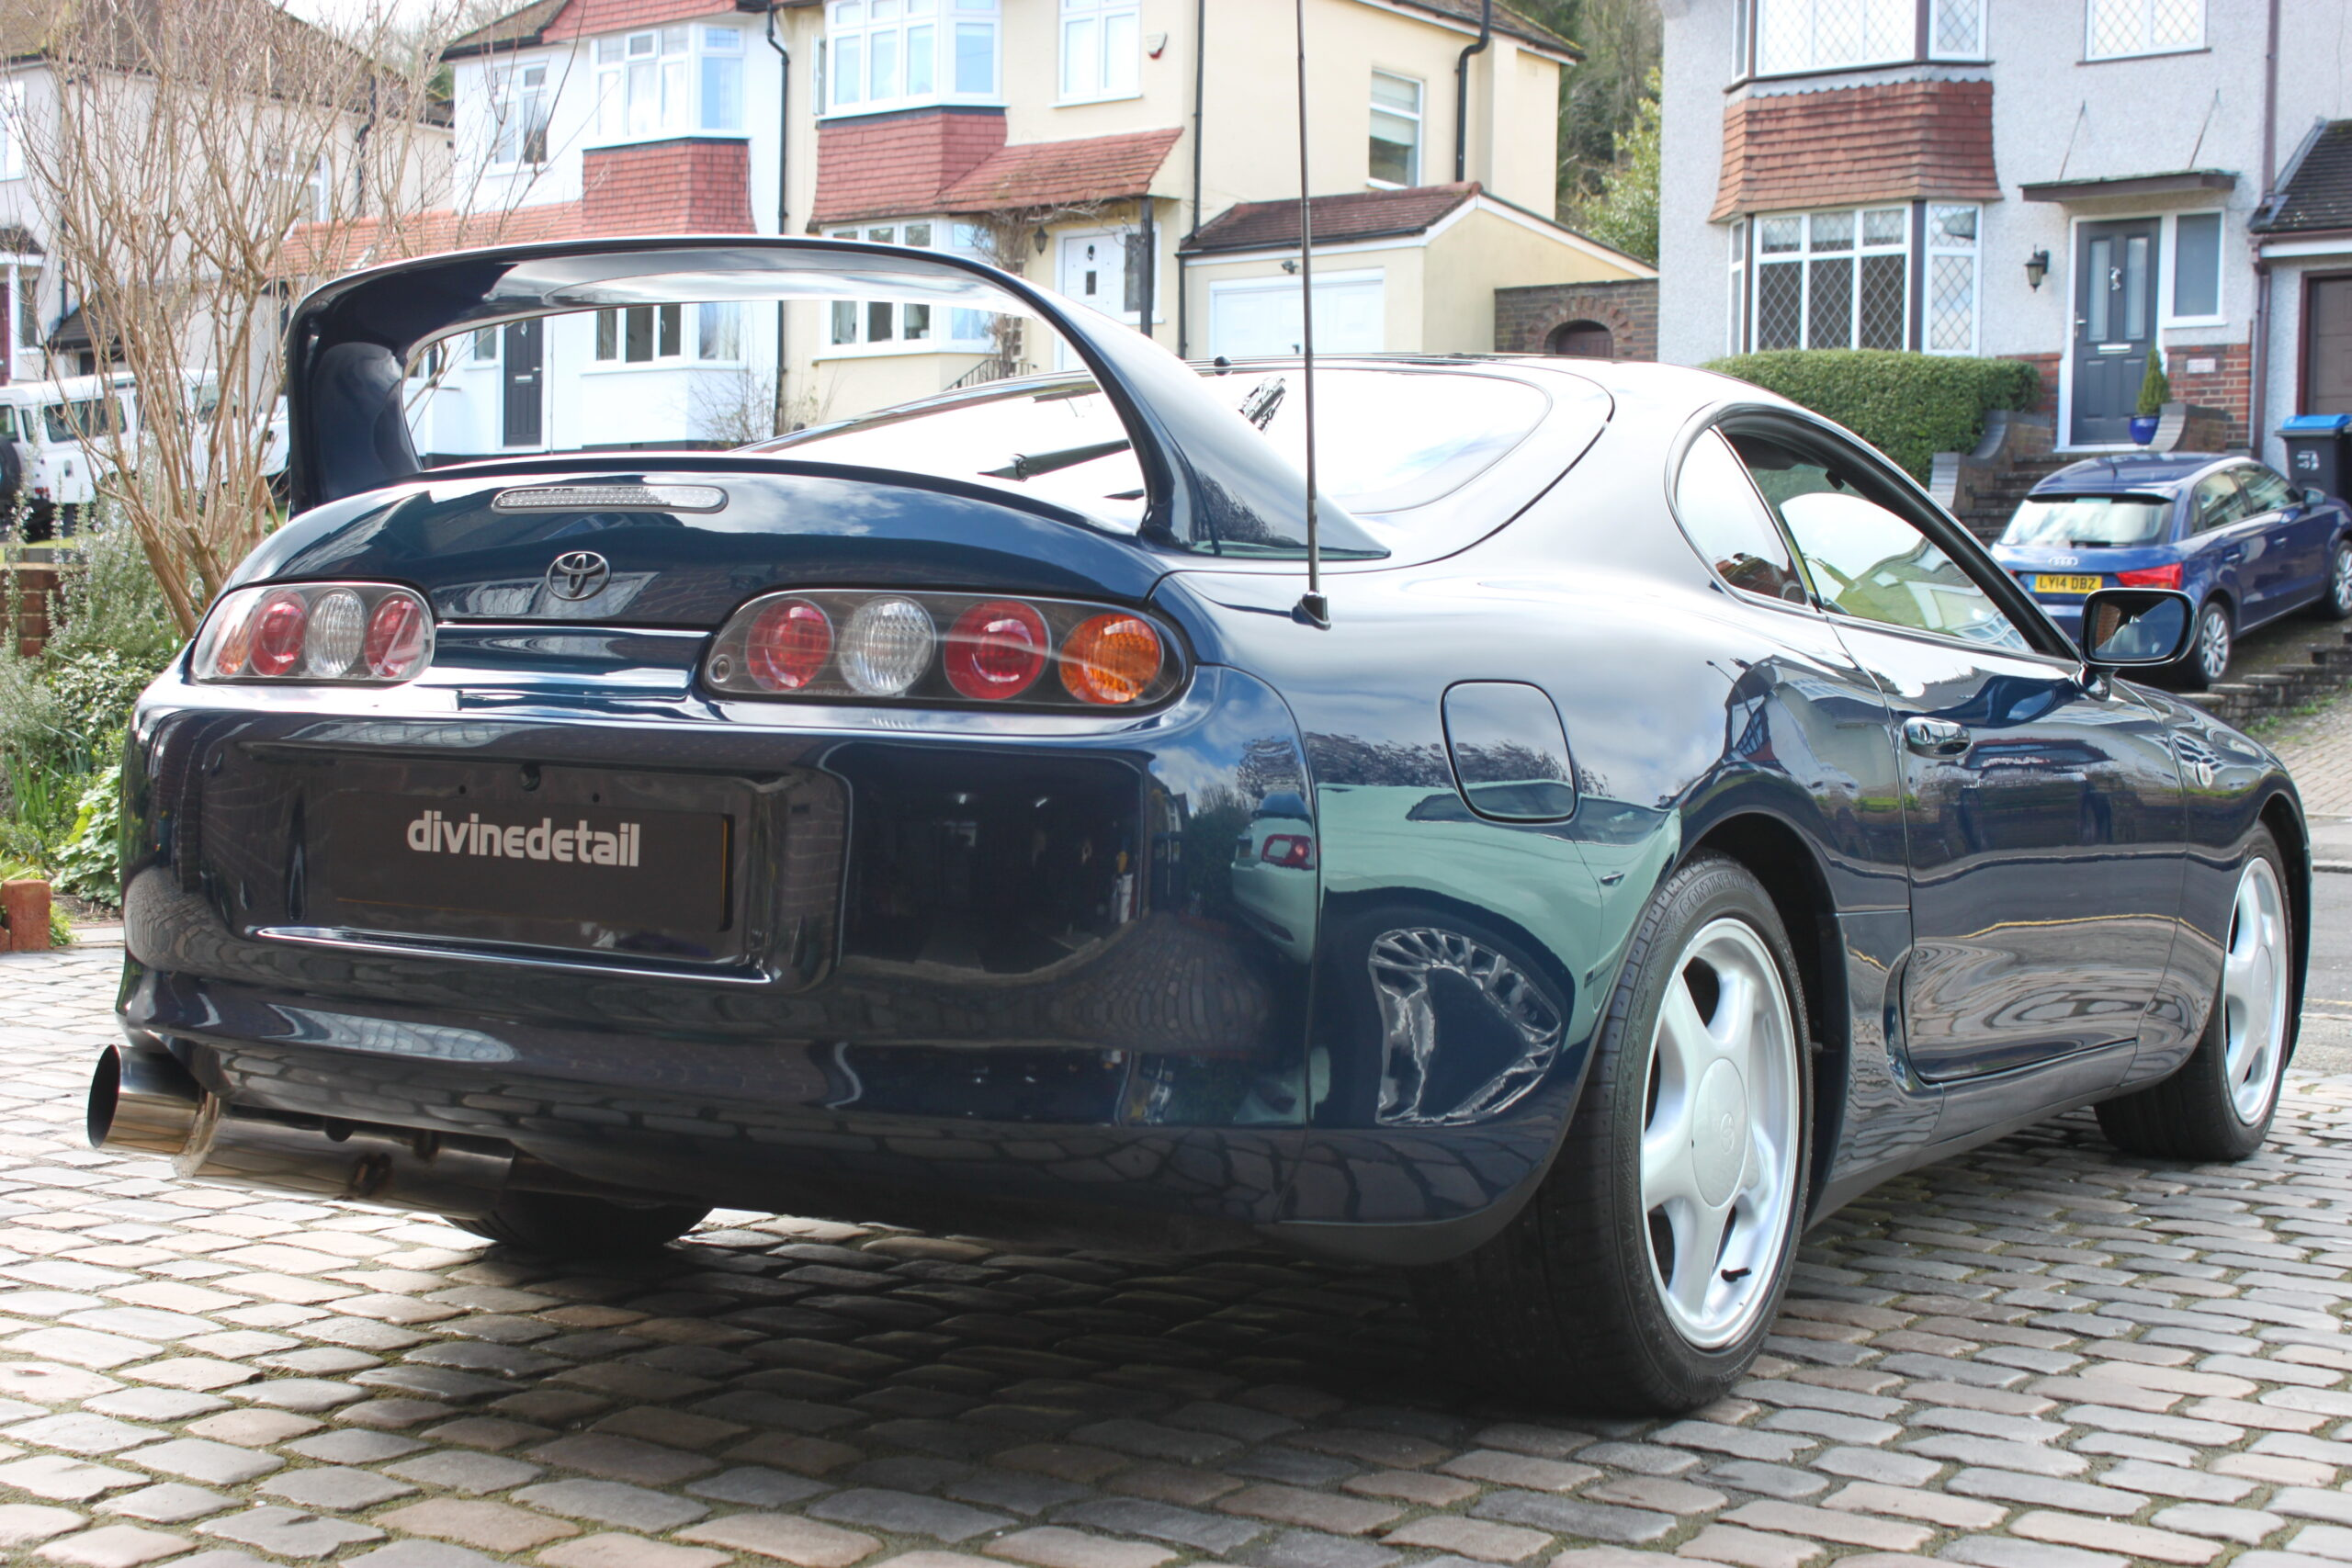 Toyota Supra detailing